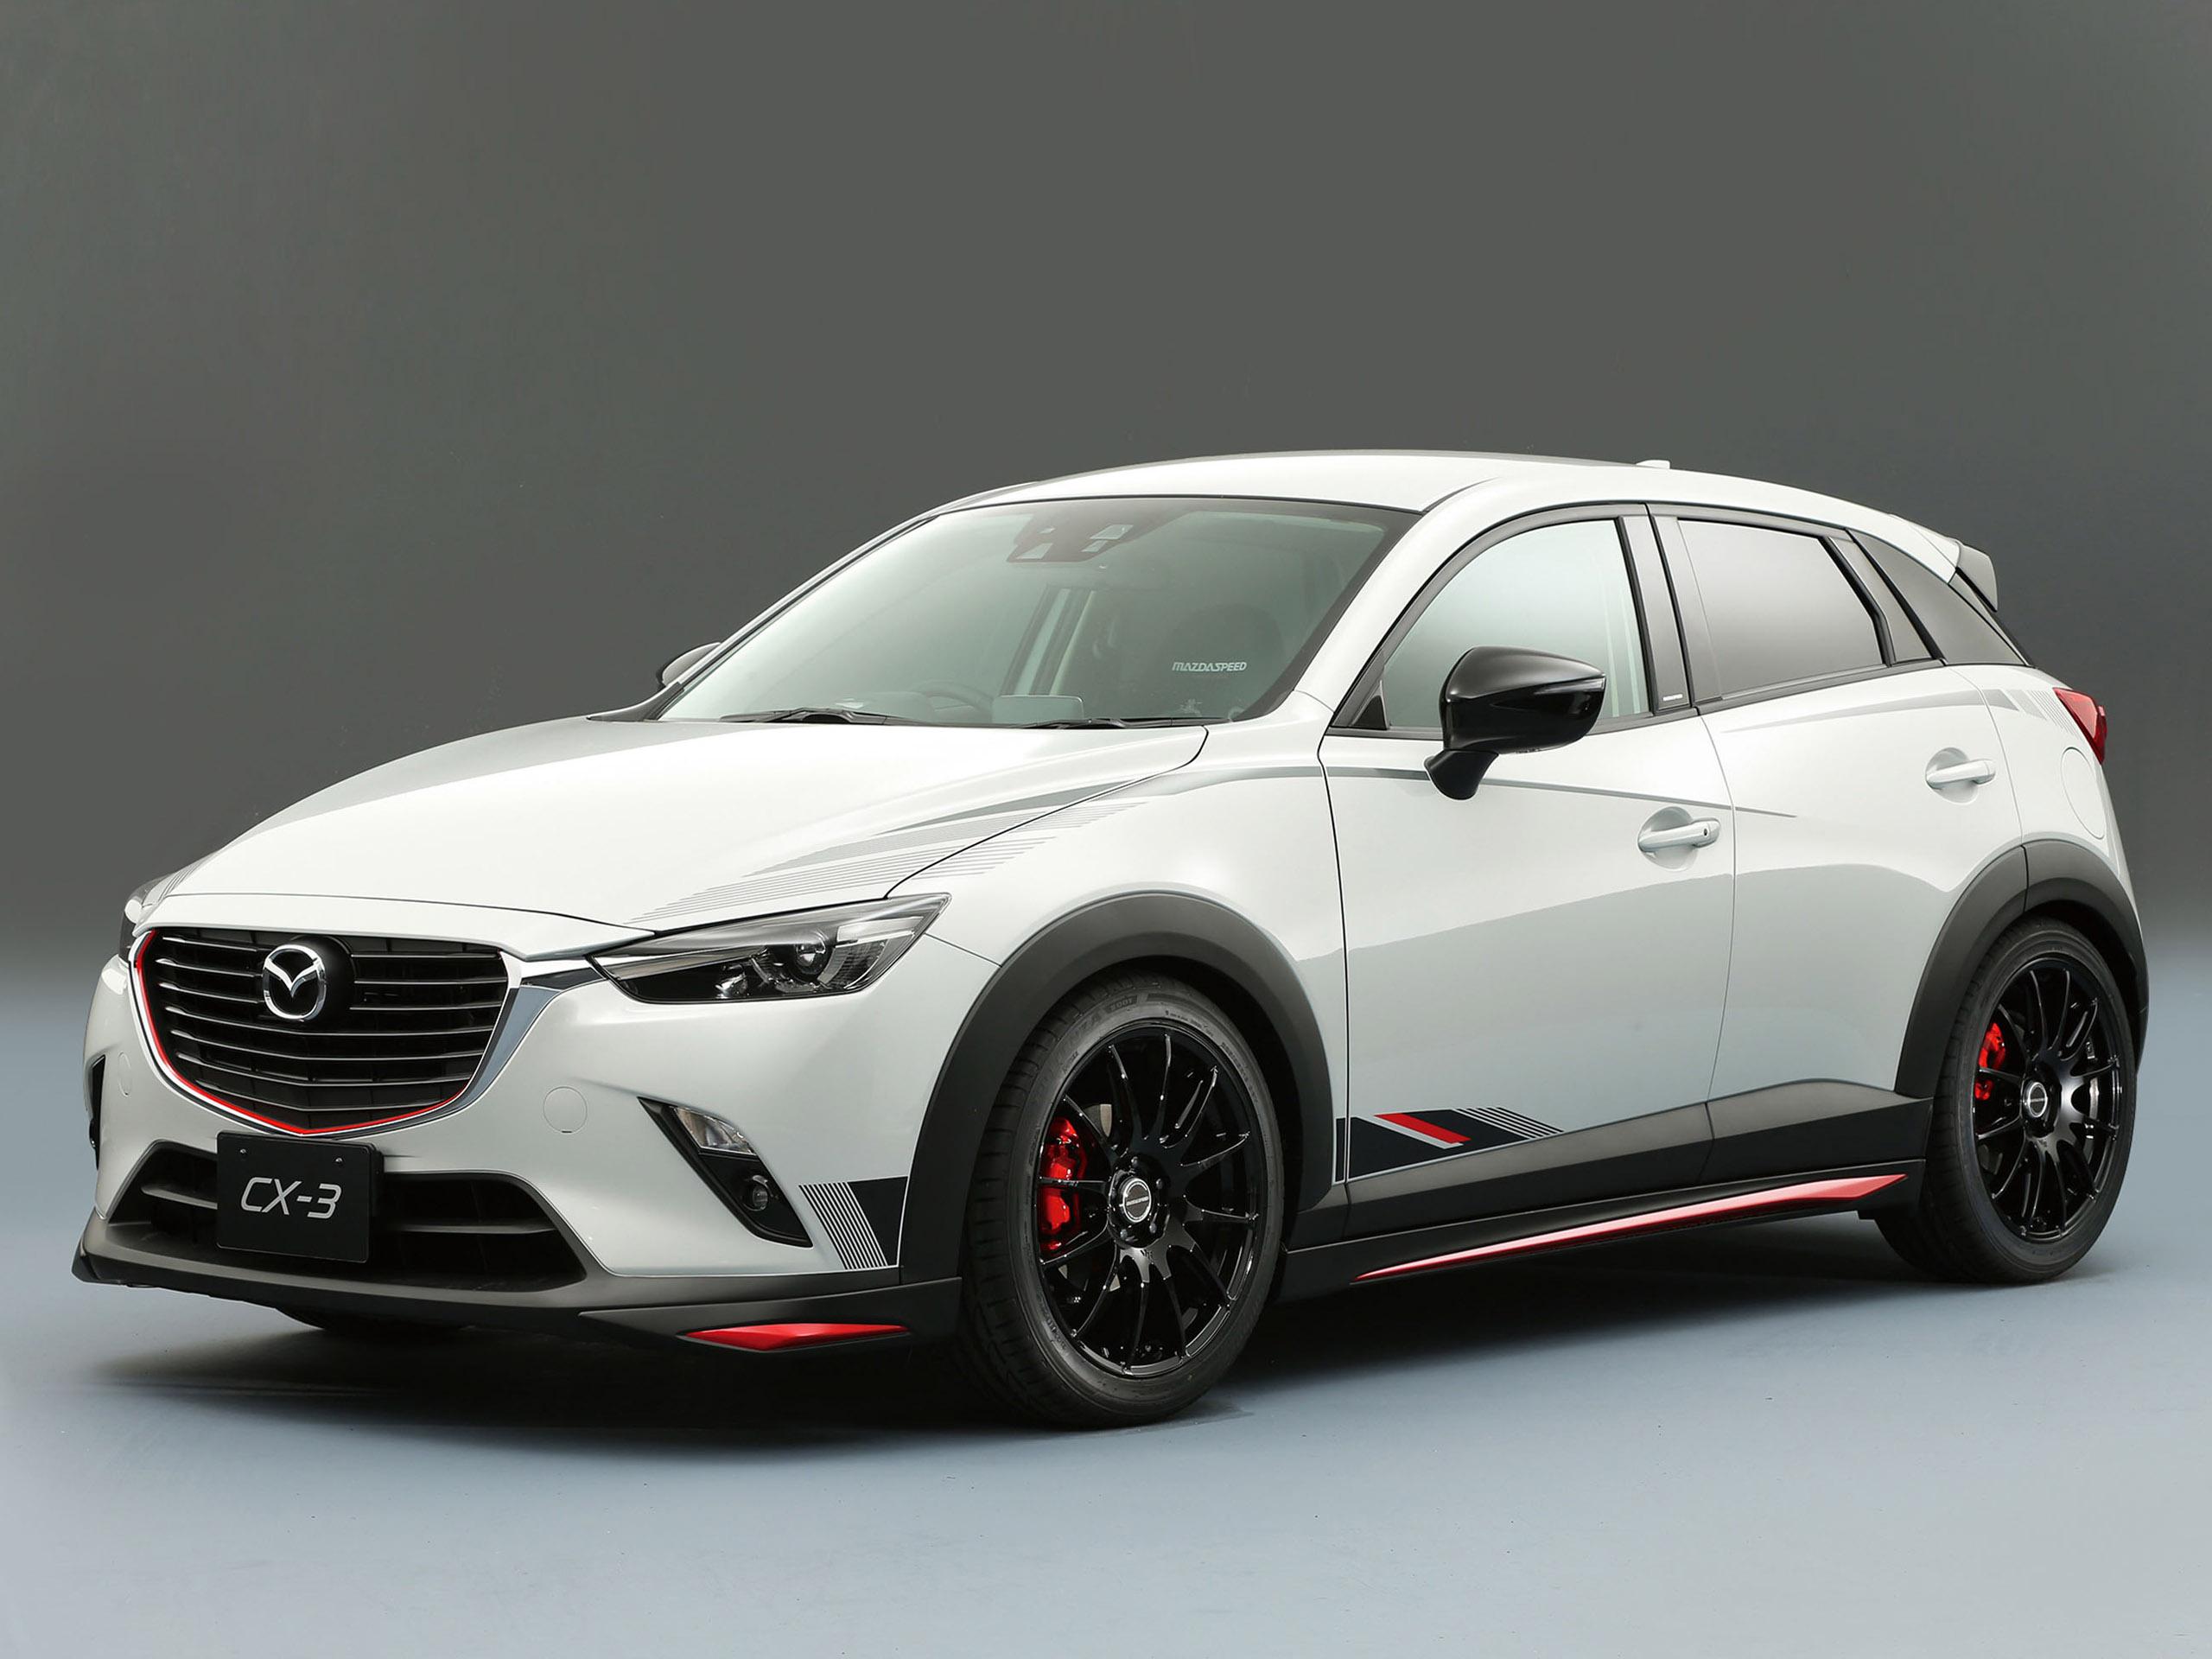 2015 Mazda CX-3 Racing Concept